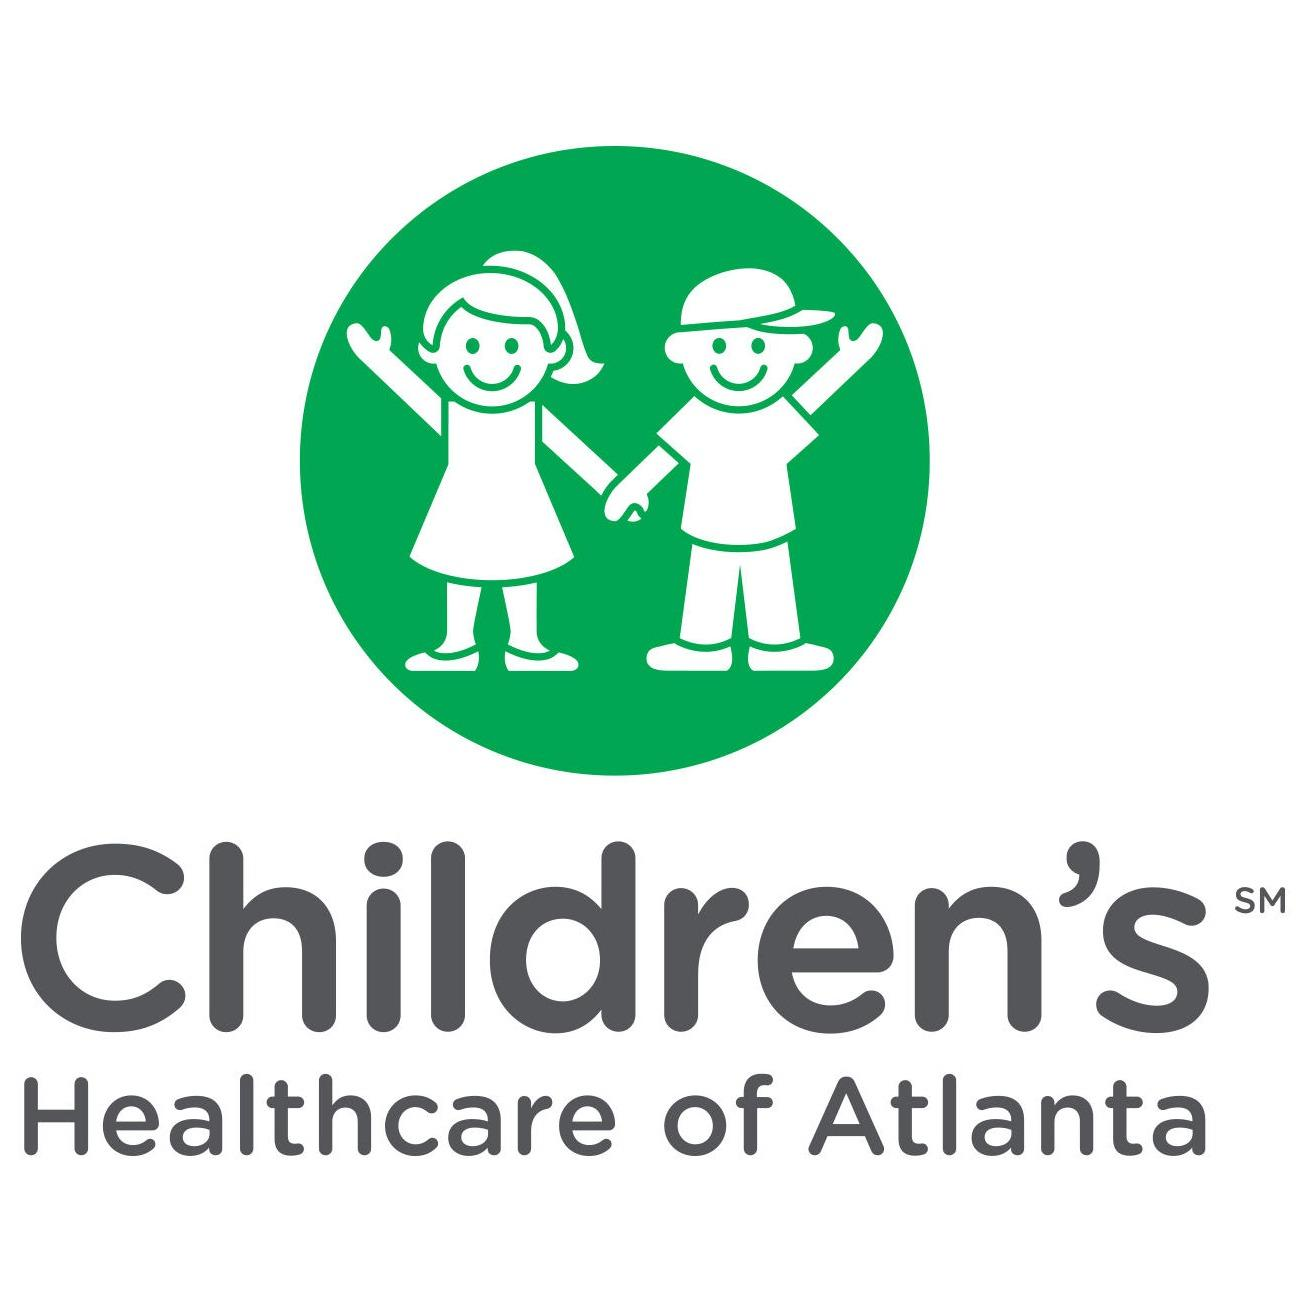 Children's Healthcare of Atlanta Orthotics and Prosthetics - Marietta image 1